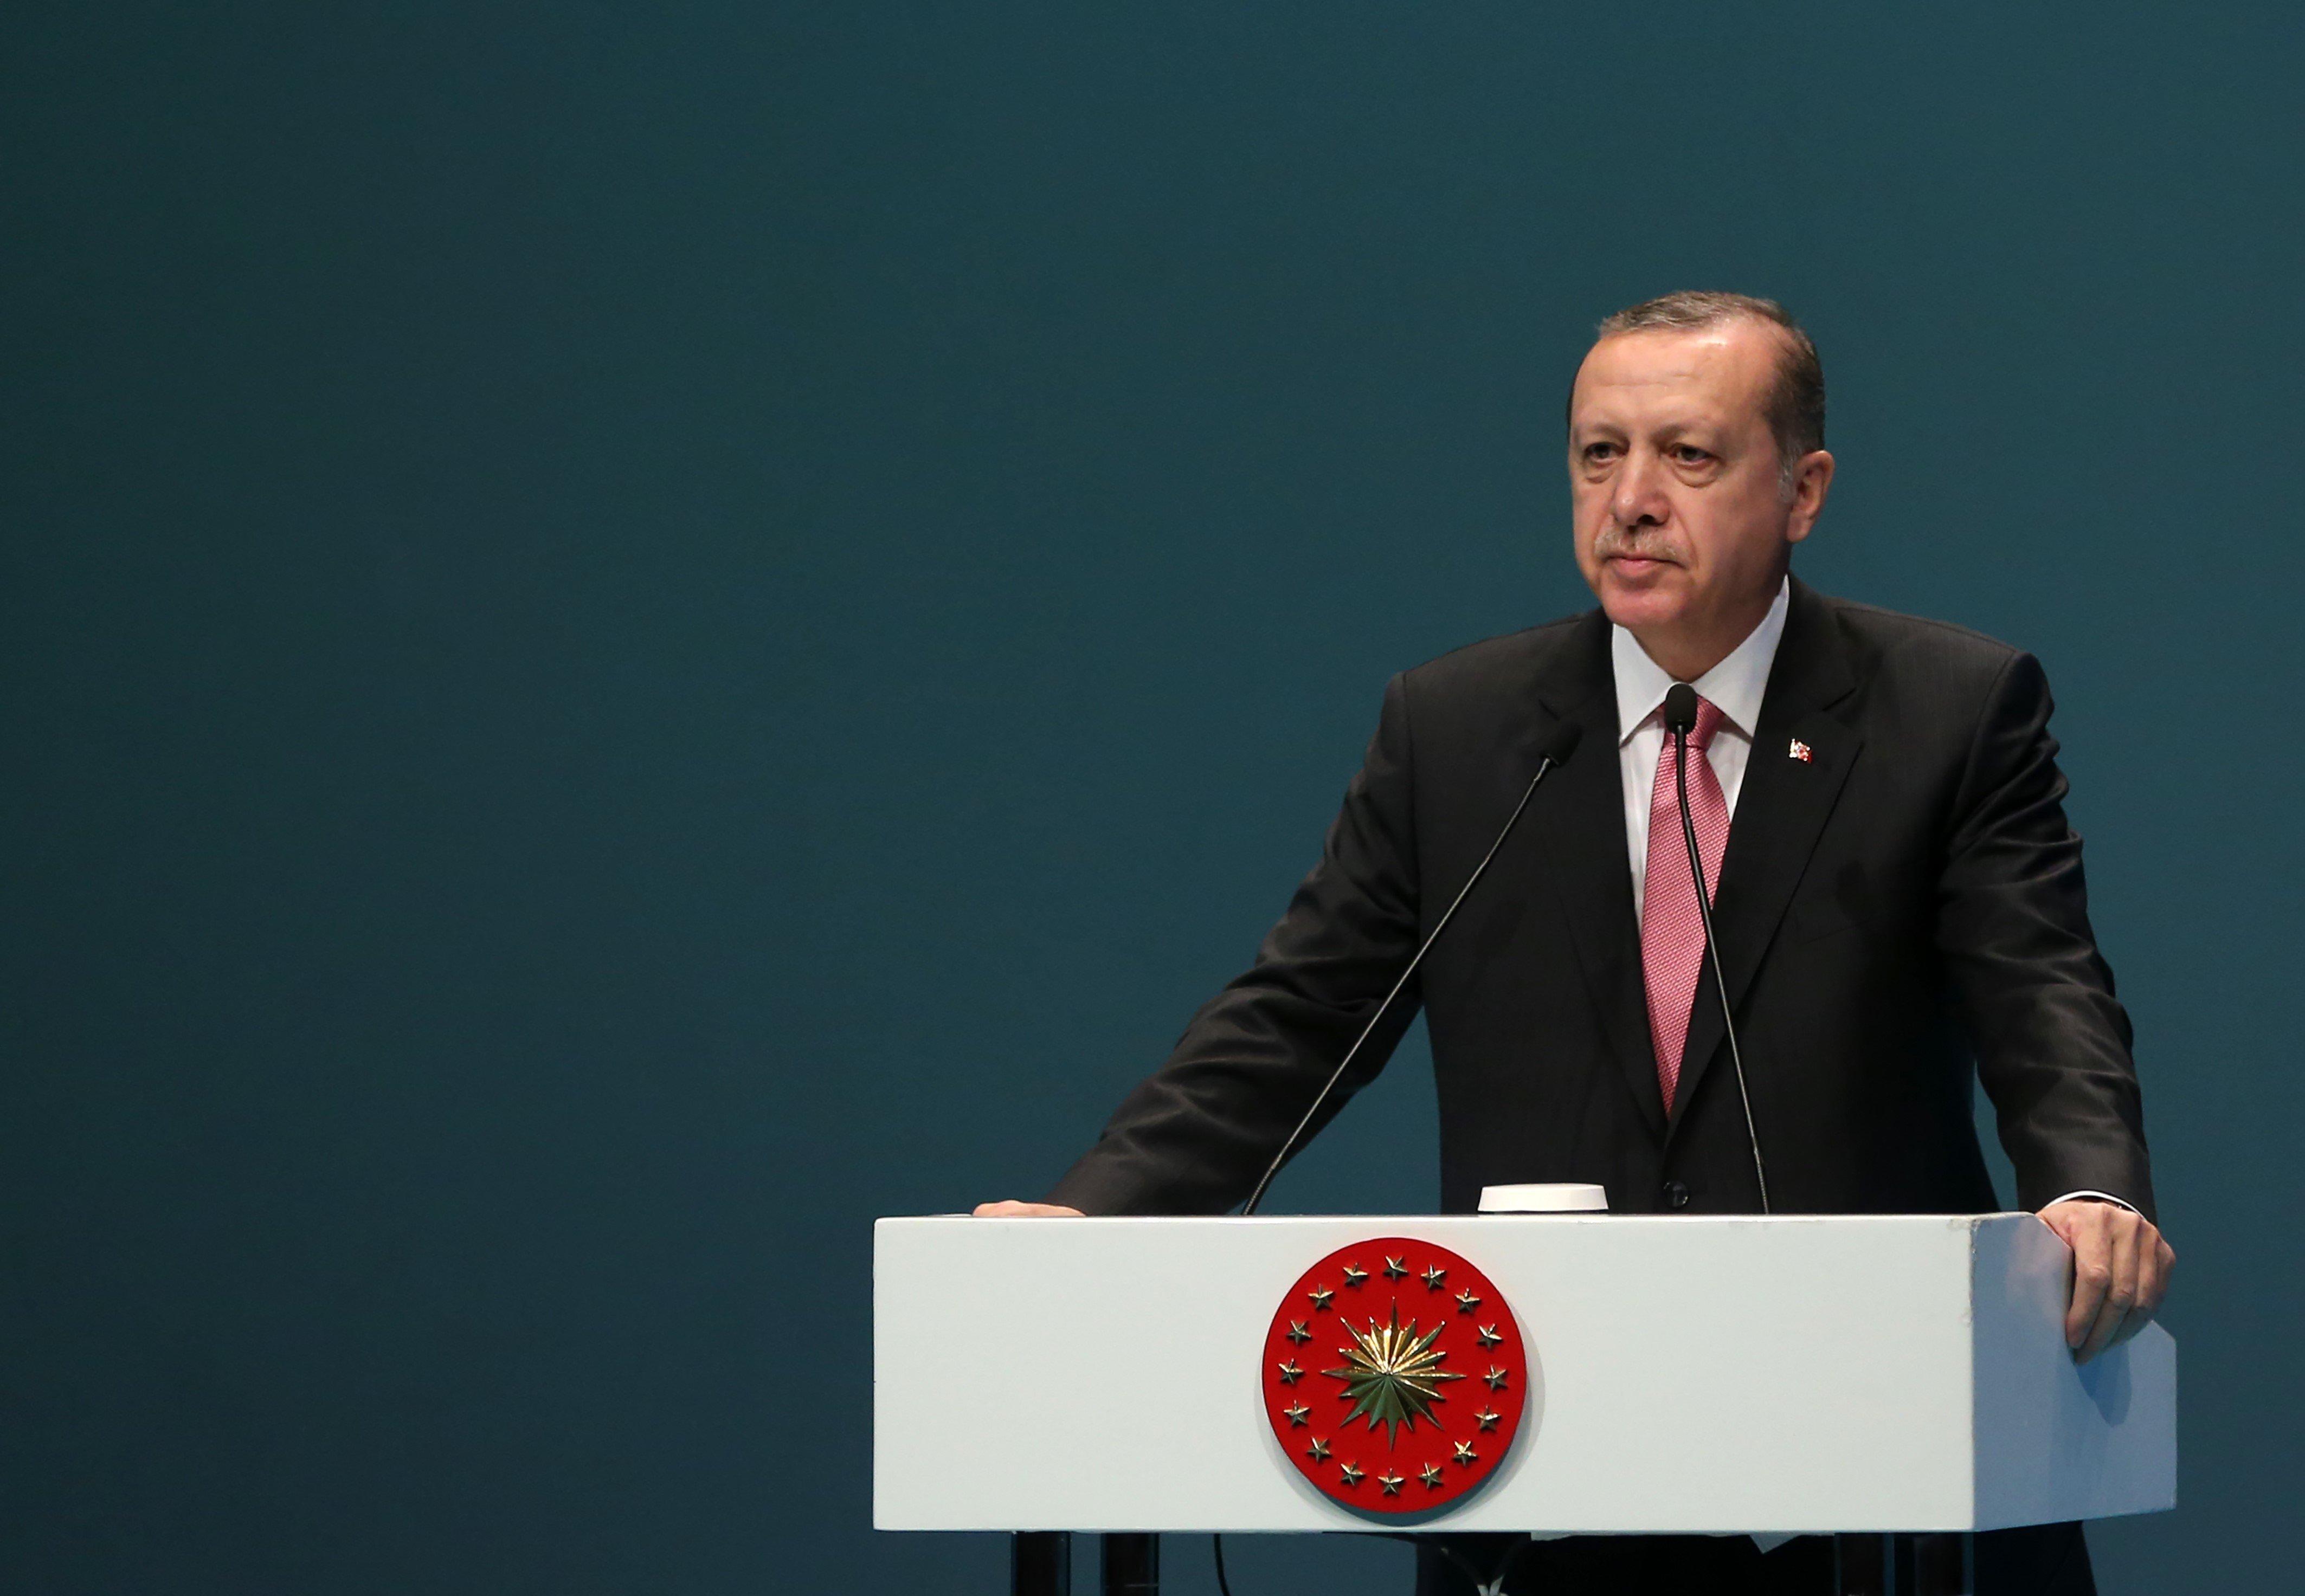 ISTANBUL, TURKEY - FEBRUARY 3 :  President Recep Tayyip Erdogan speaks during the National Cultural Council in Istanbul, Turkey on February 3, 2017. (Photo by Metin Pala/Anadolu Agency/Getty Images)